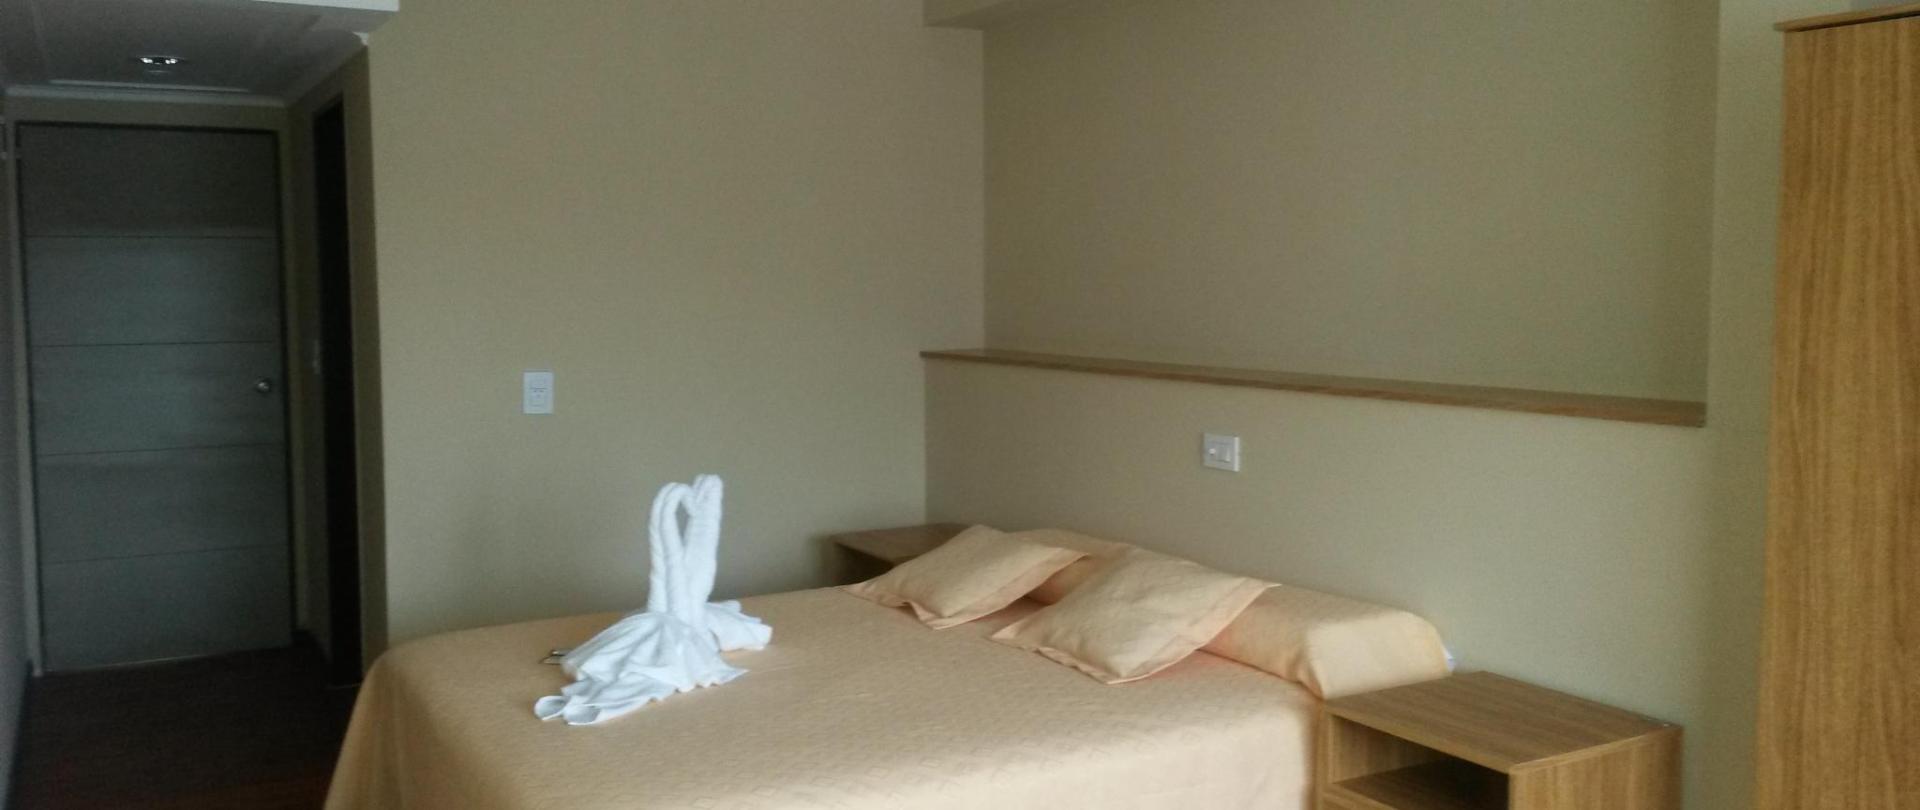 Hotel Algarrobo